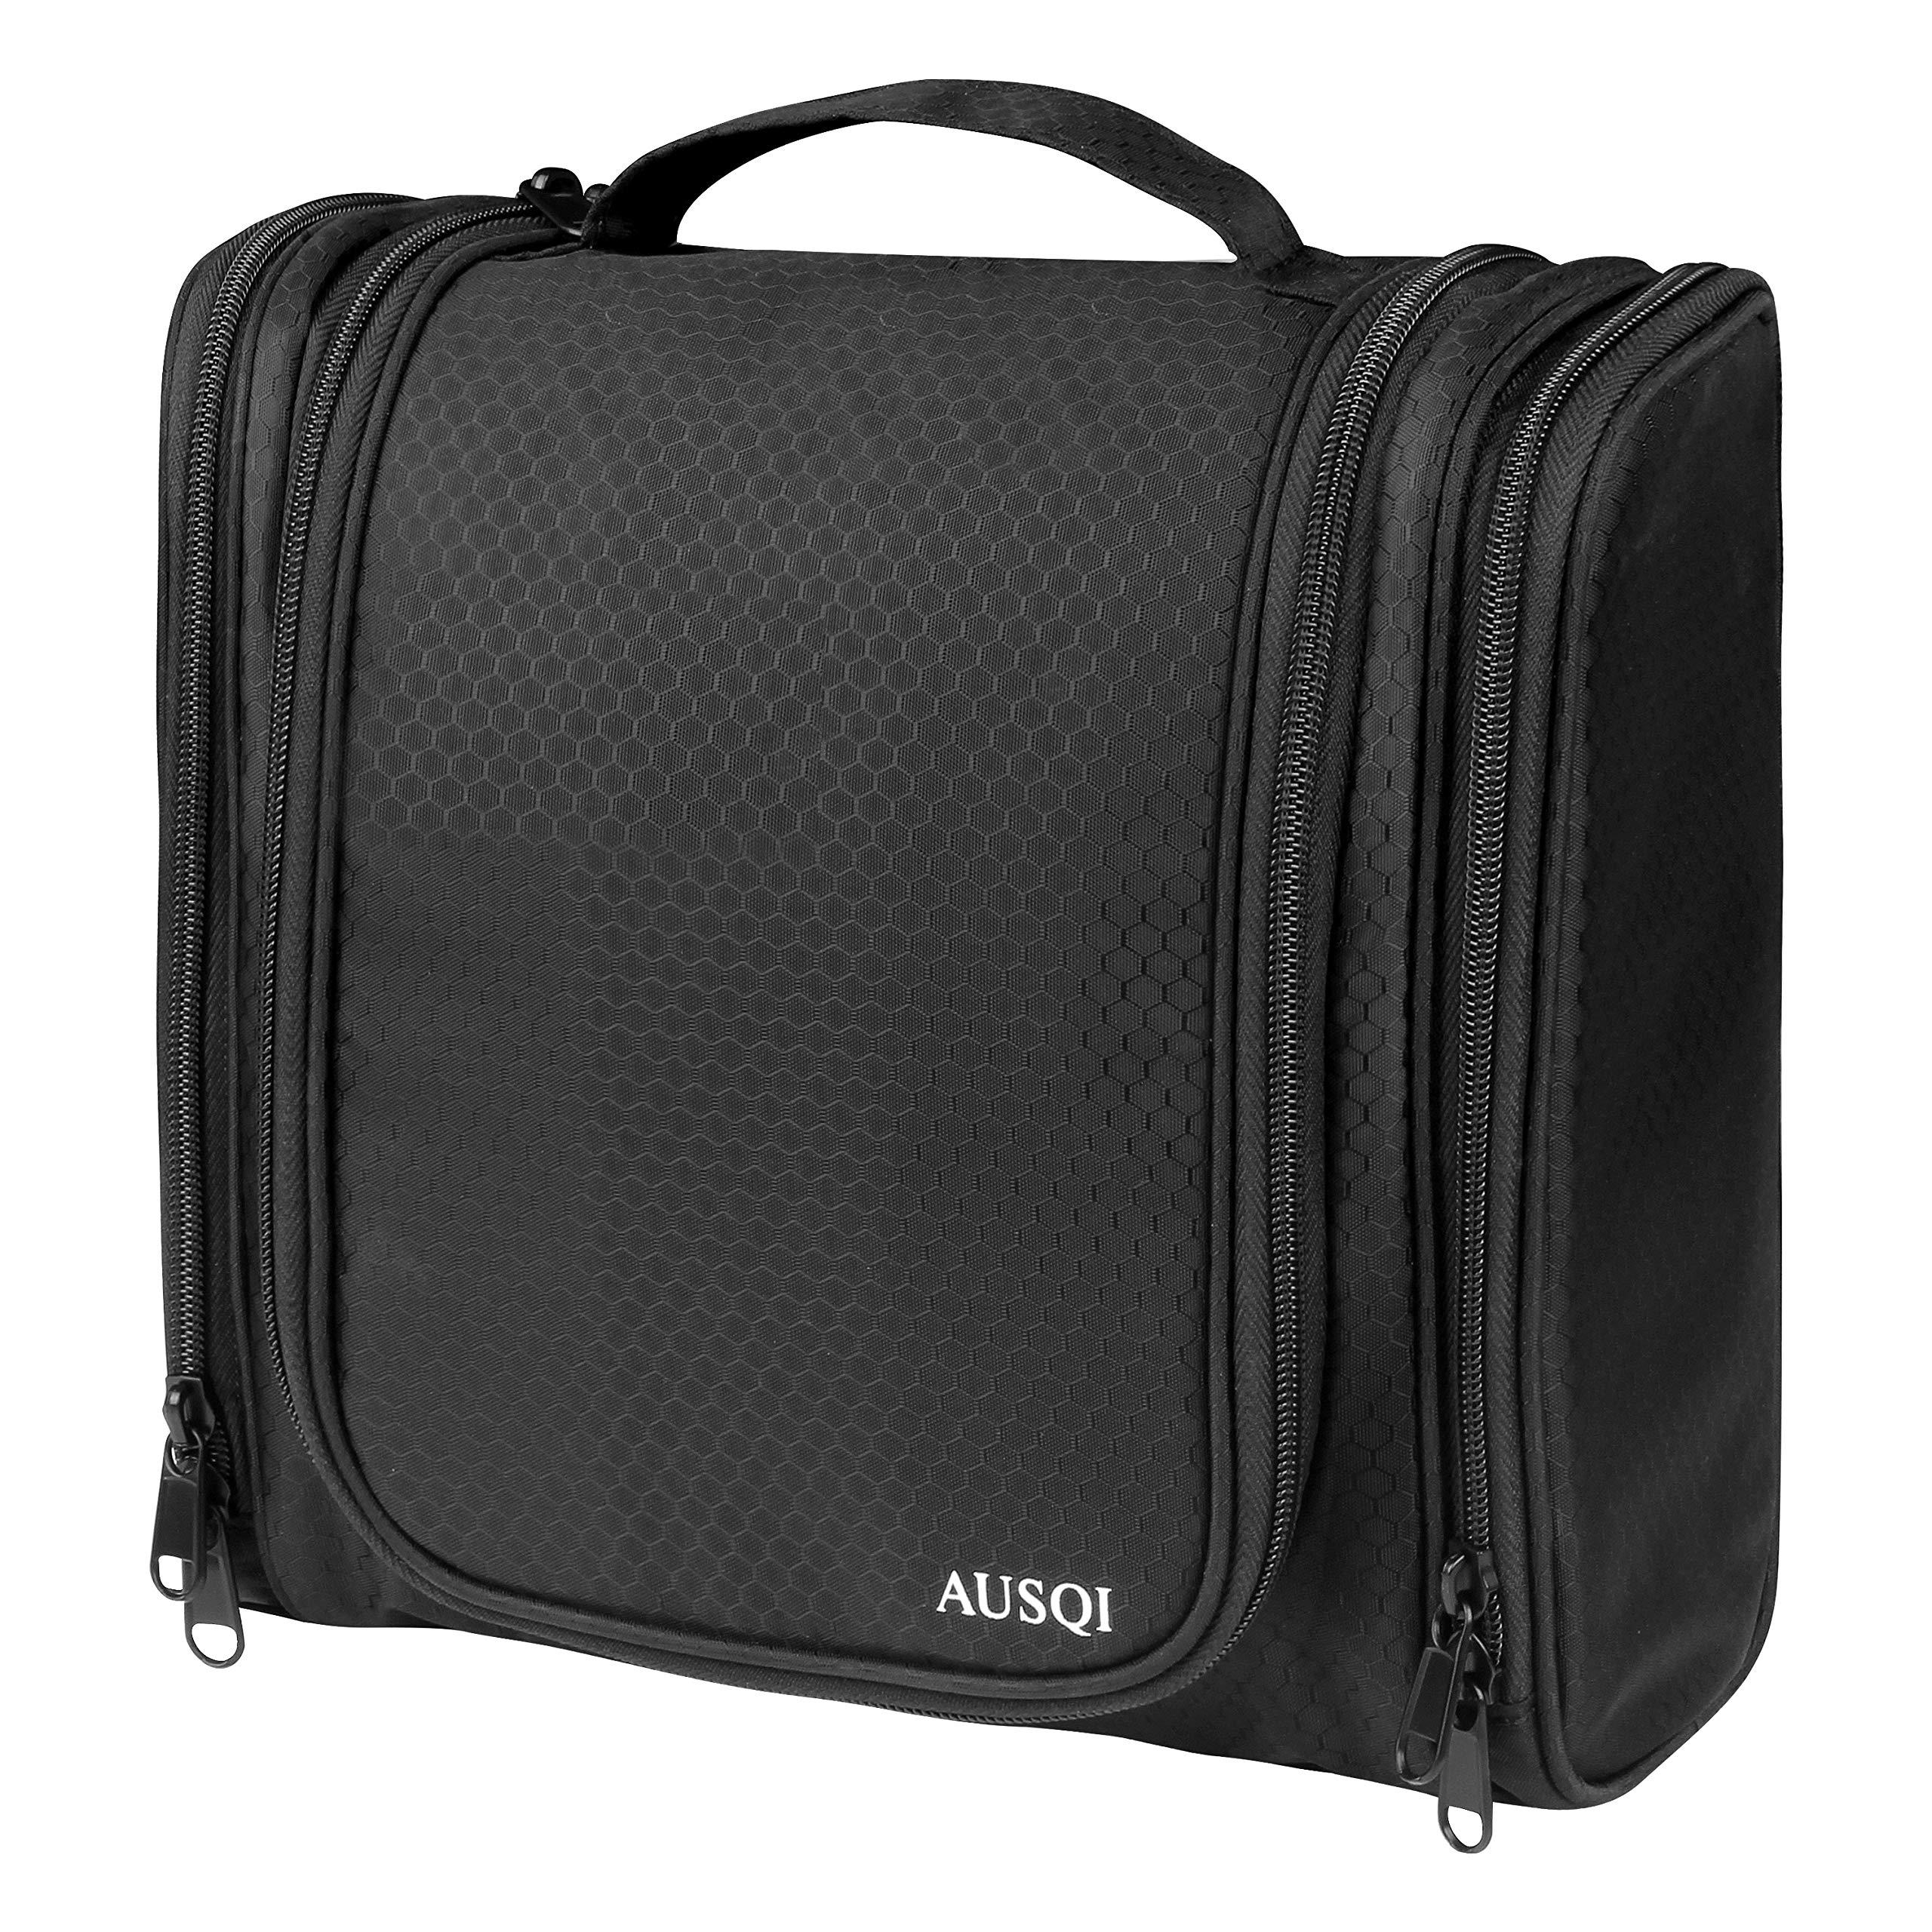 AUSQI Hanging Travel Toiletry Bag Waterproof Cosmetics Organizer Bag Multifunction Bathroom Shower Bag, Top Gifting Idea For Men & Women